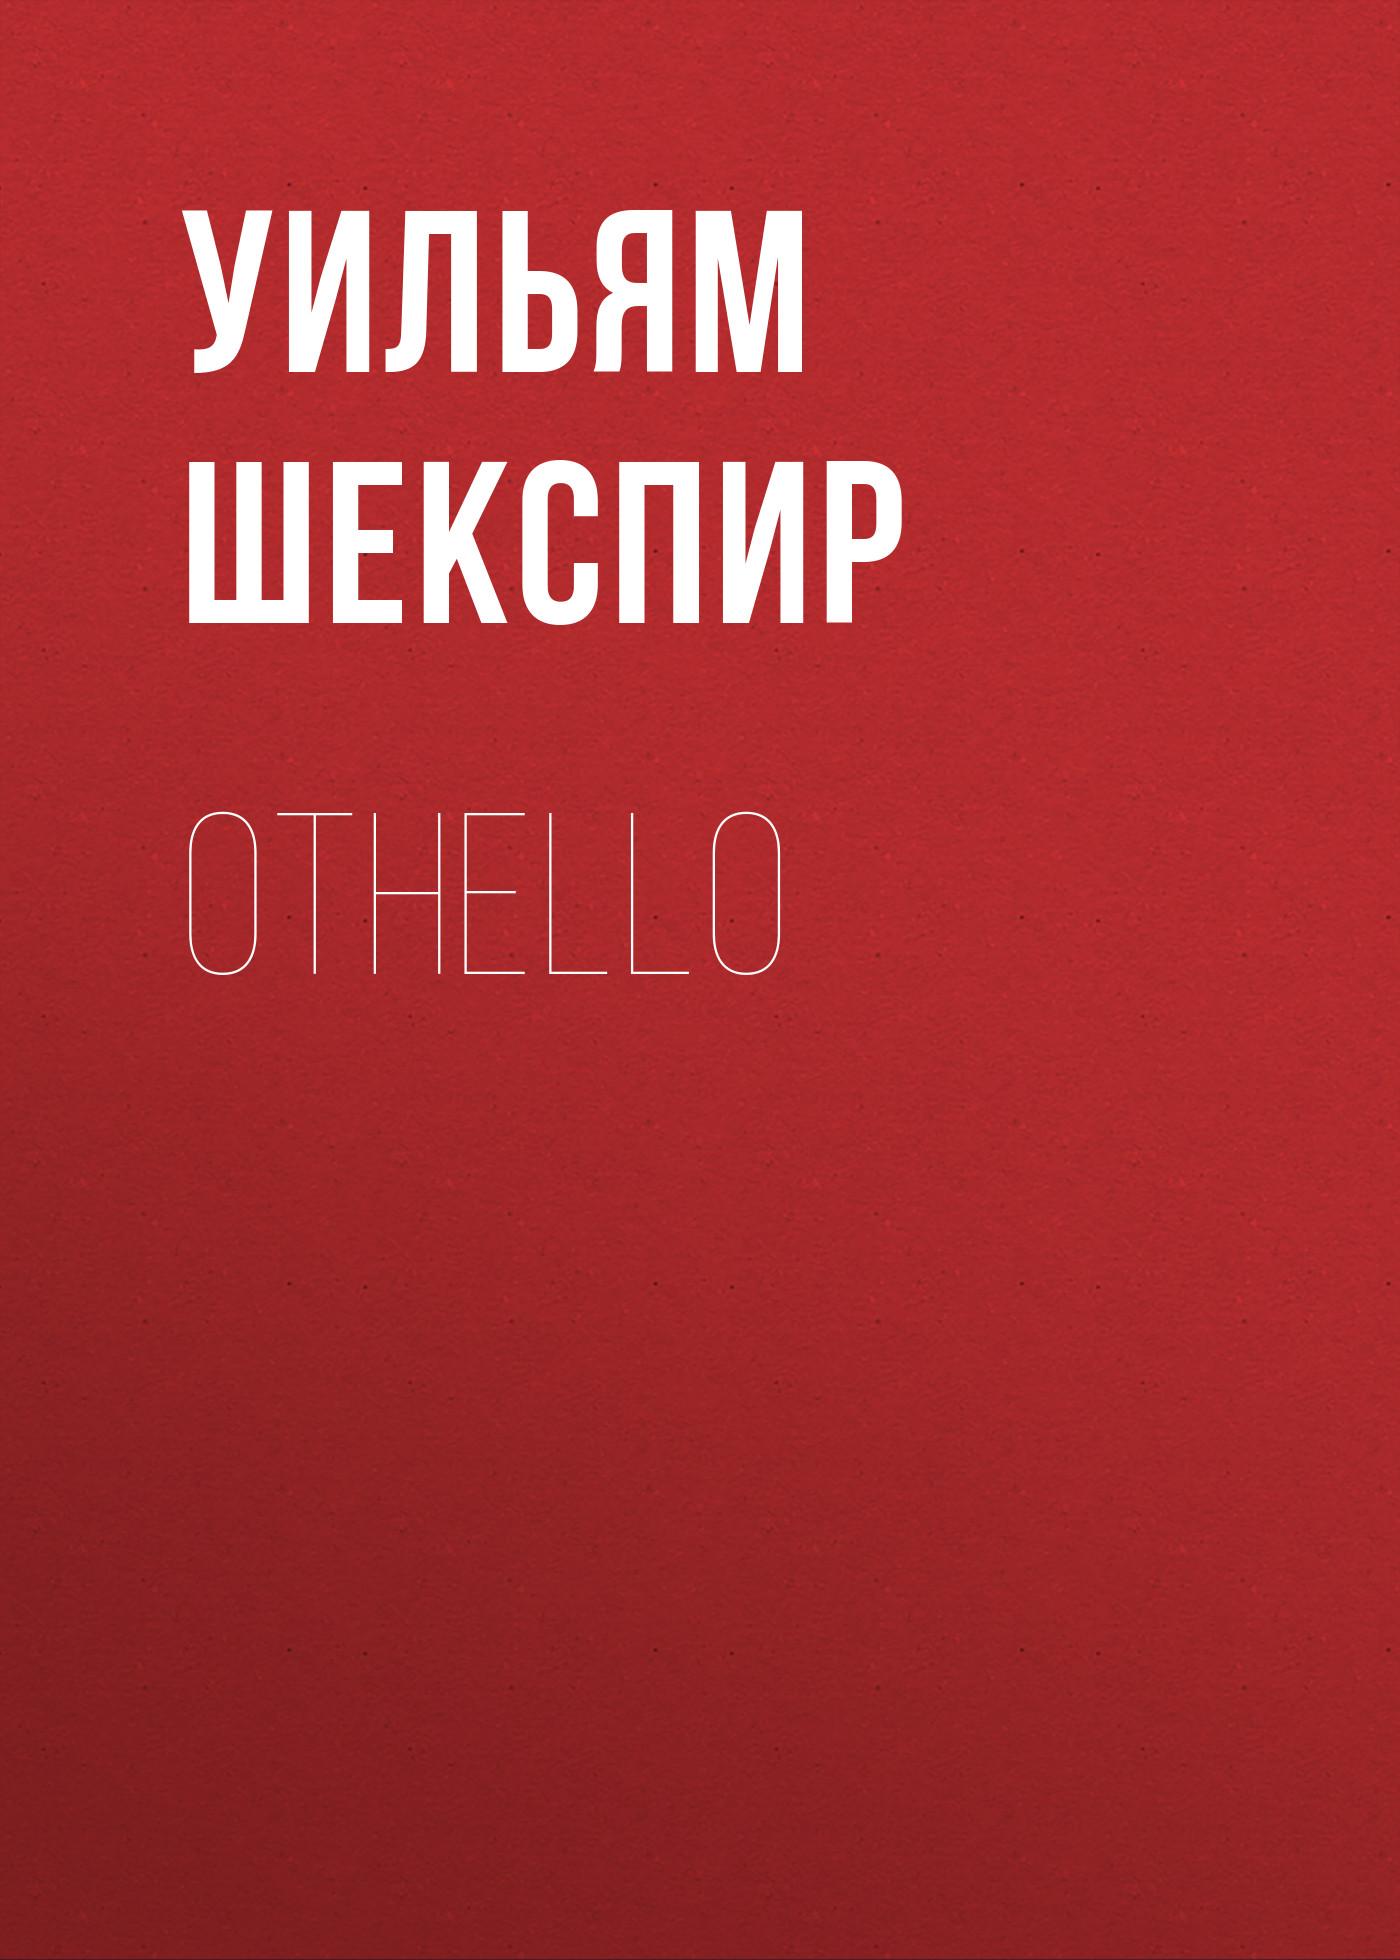 Уильям Шекспир Othello